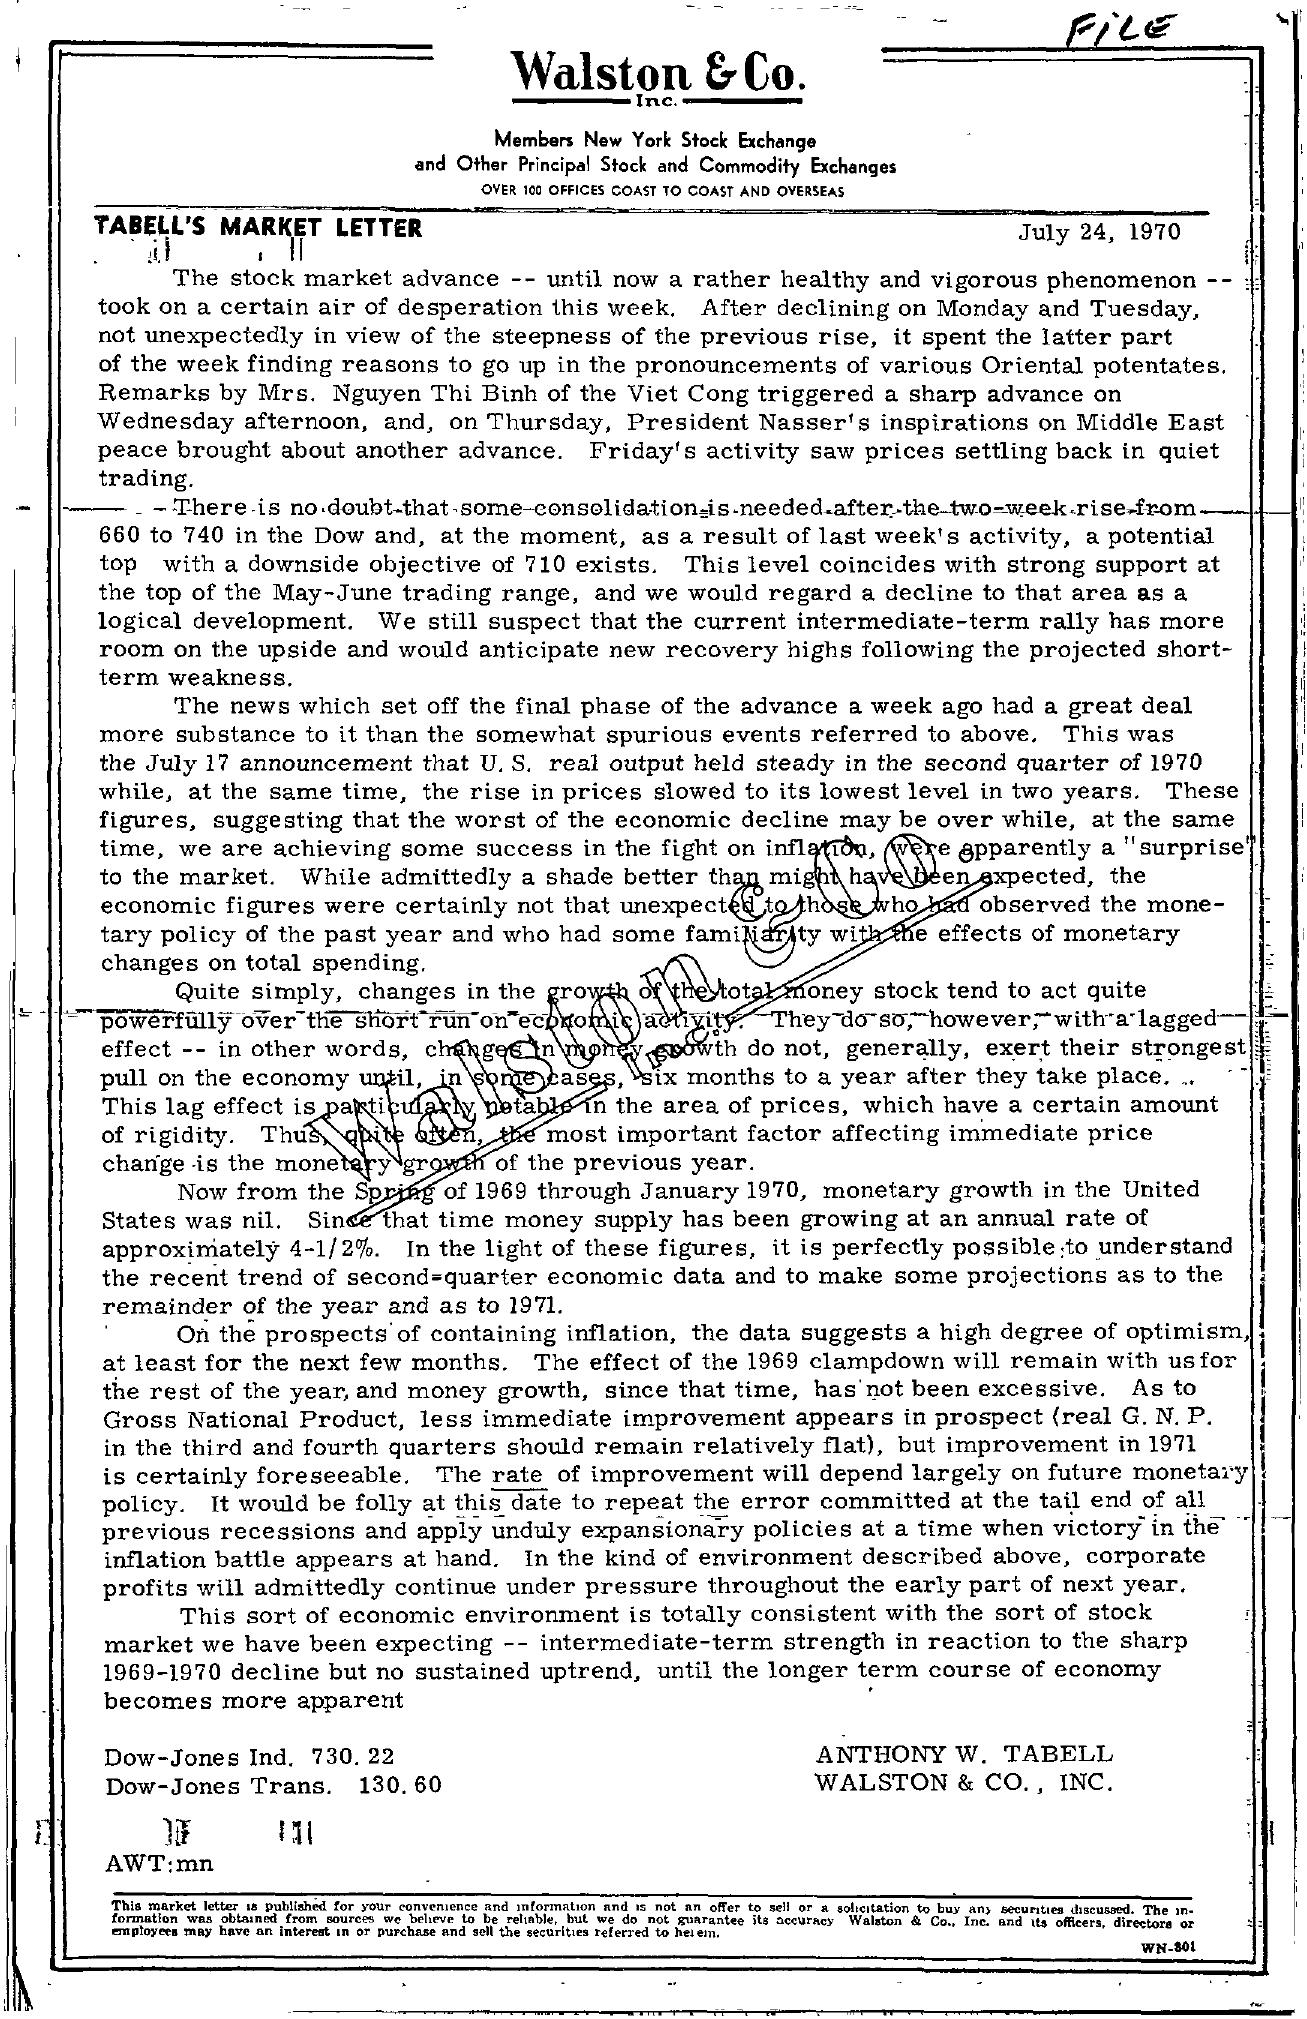 Tabell's Market Letter - July 24, 1970